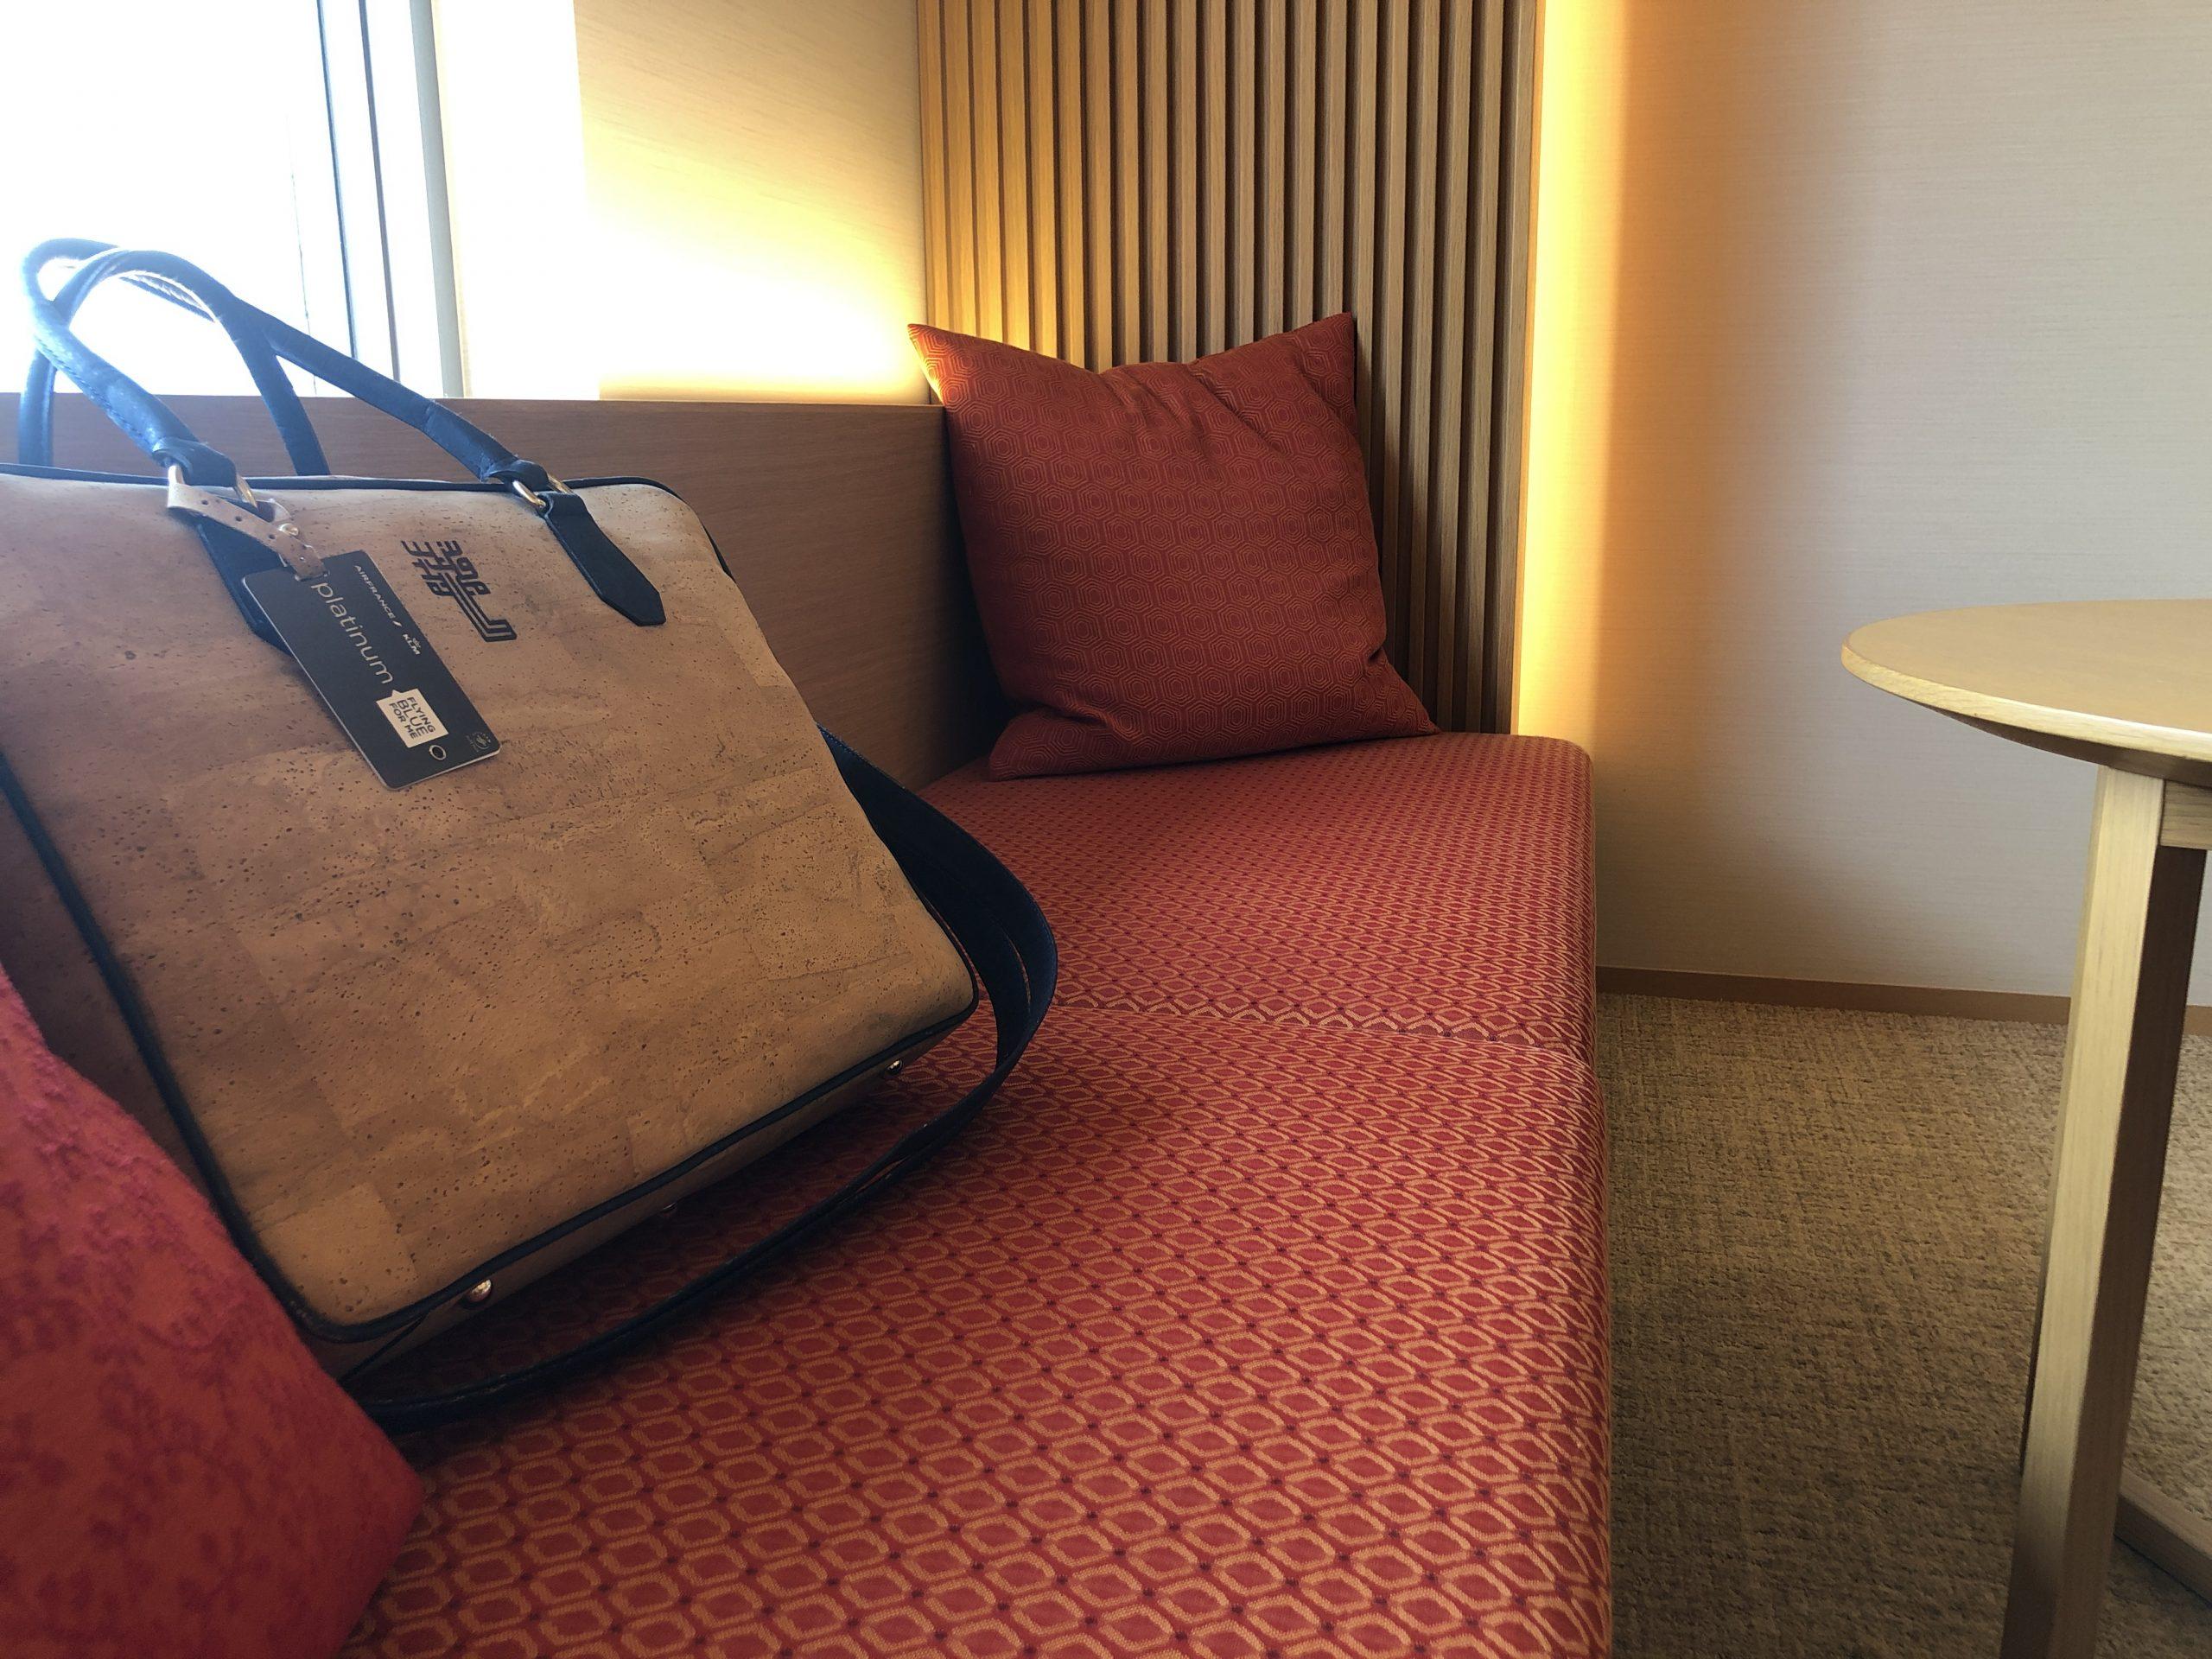 Hotel Review : ANAクラウンプラザホテル京都 (ANA Crowne Plaza Hotel Kyoto)